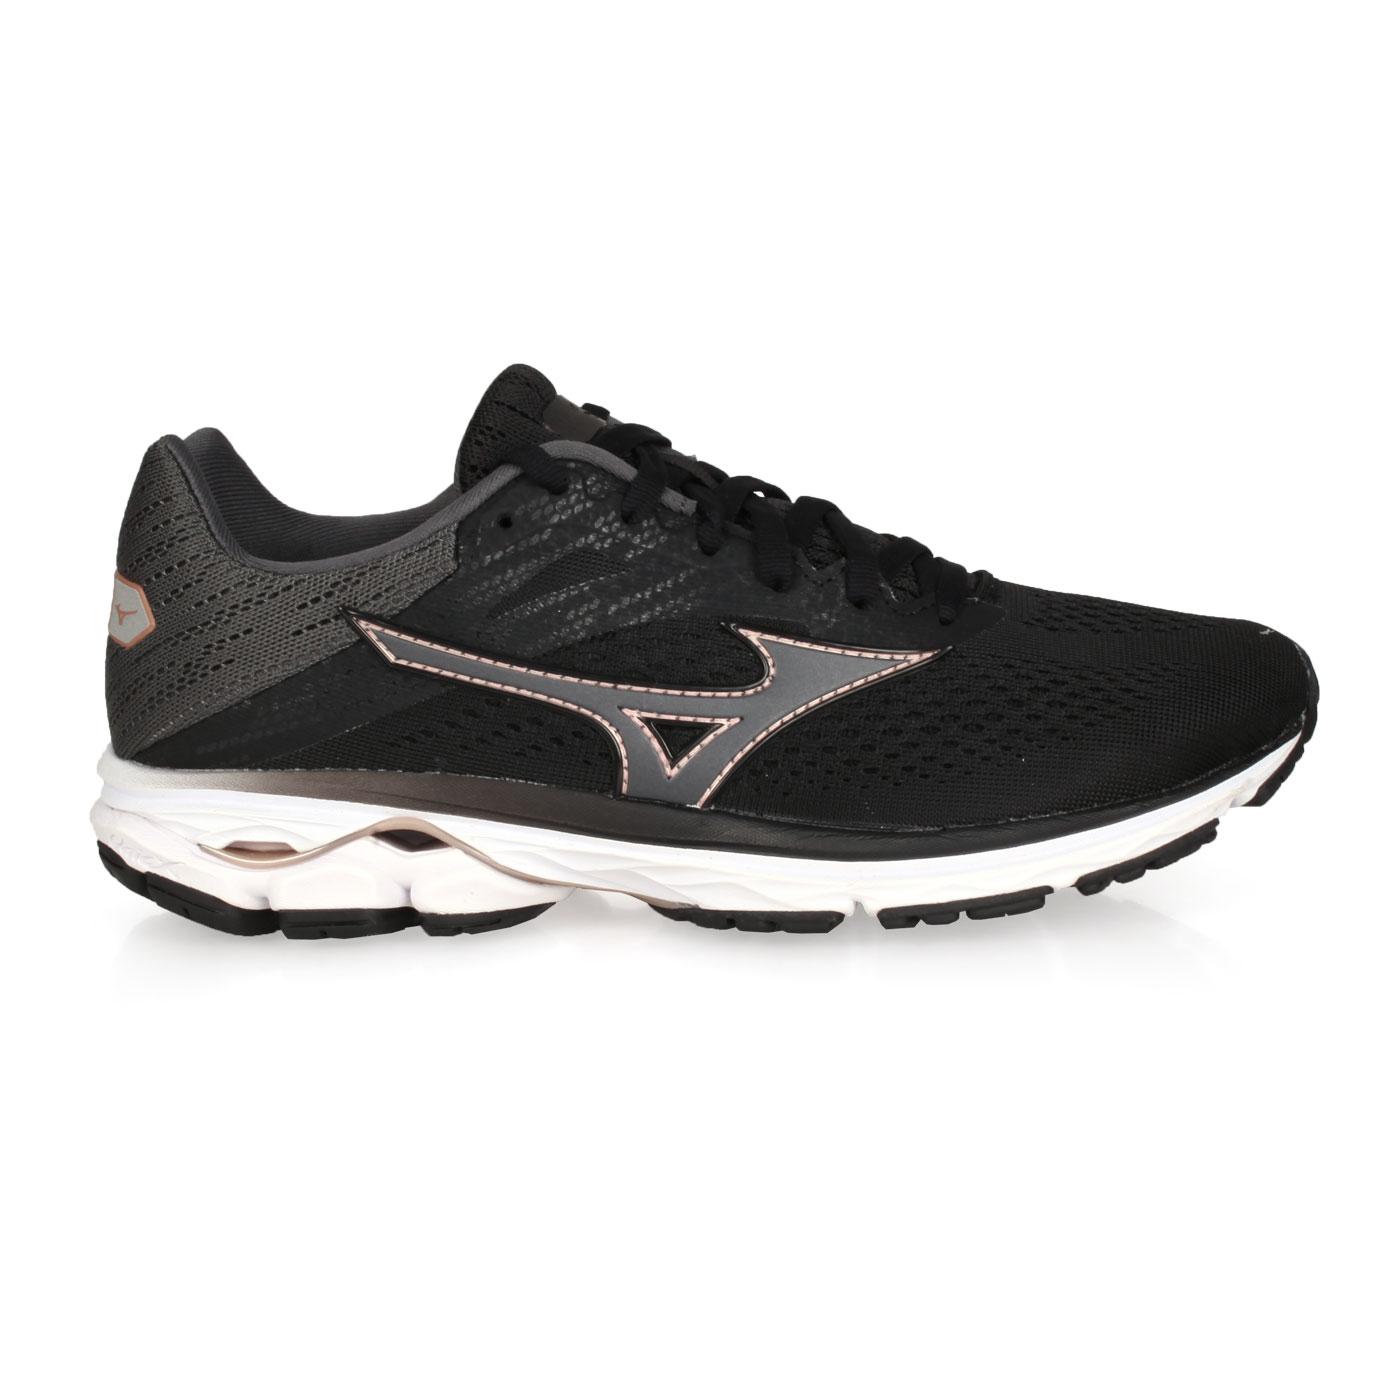 MIZUNO 女款慢跑鞋  @WAVE RIDER 23@J1GD190330 - 黑灰玫瑰金